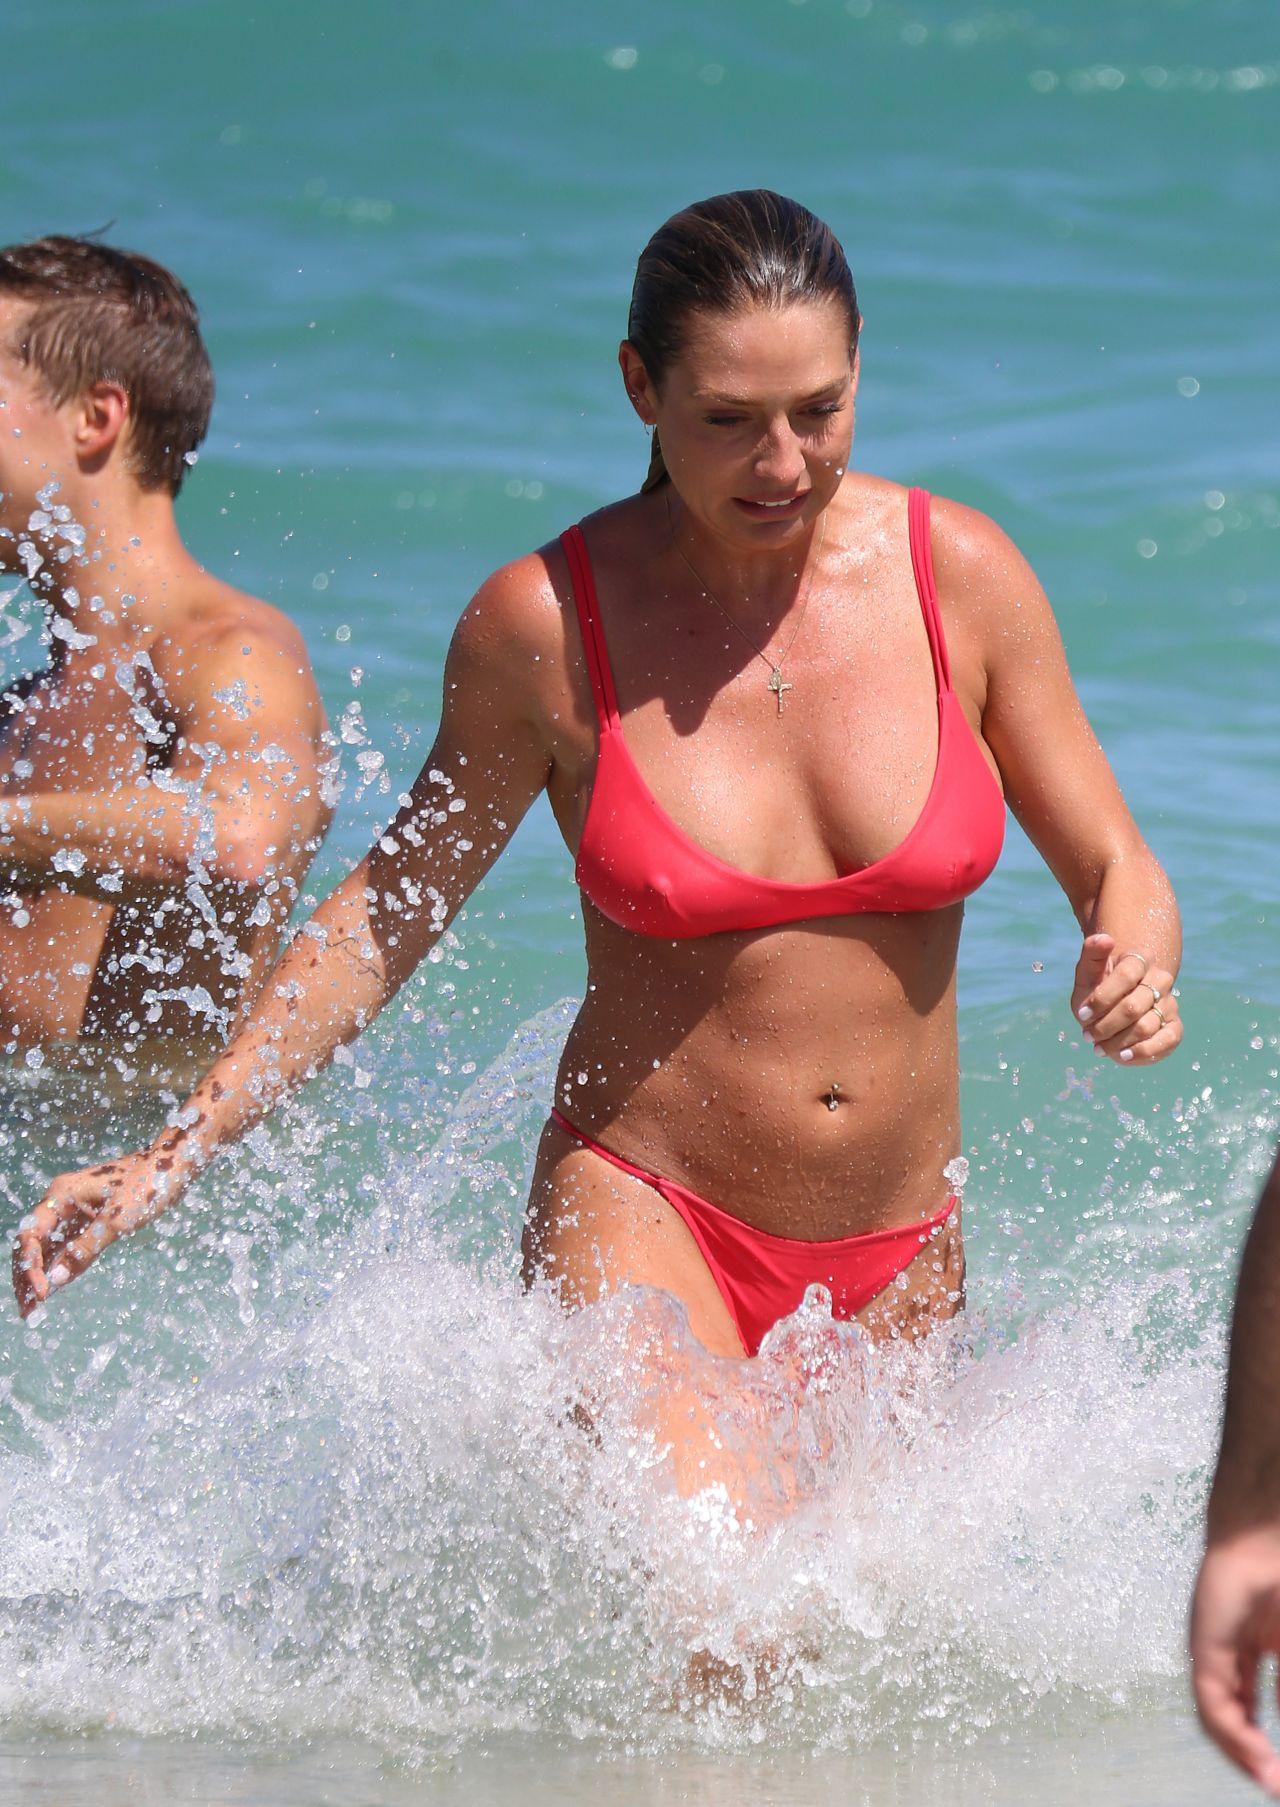 Lisa Clarke in Black Bikini at Tamarama Beach in Sydney Pic 25 of 35